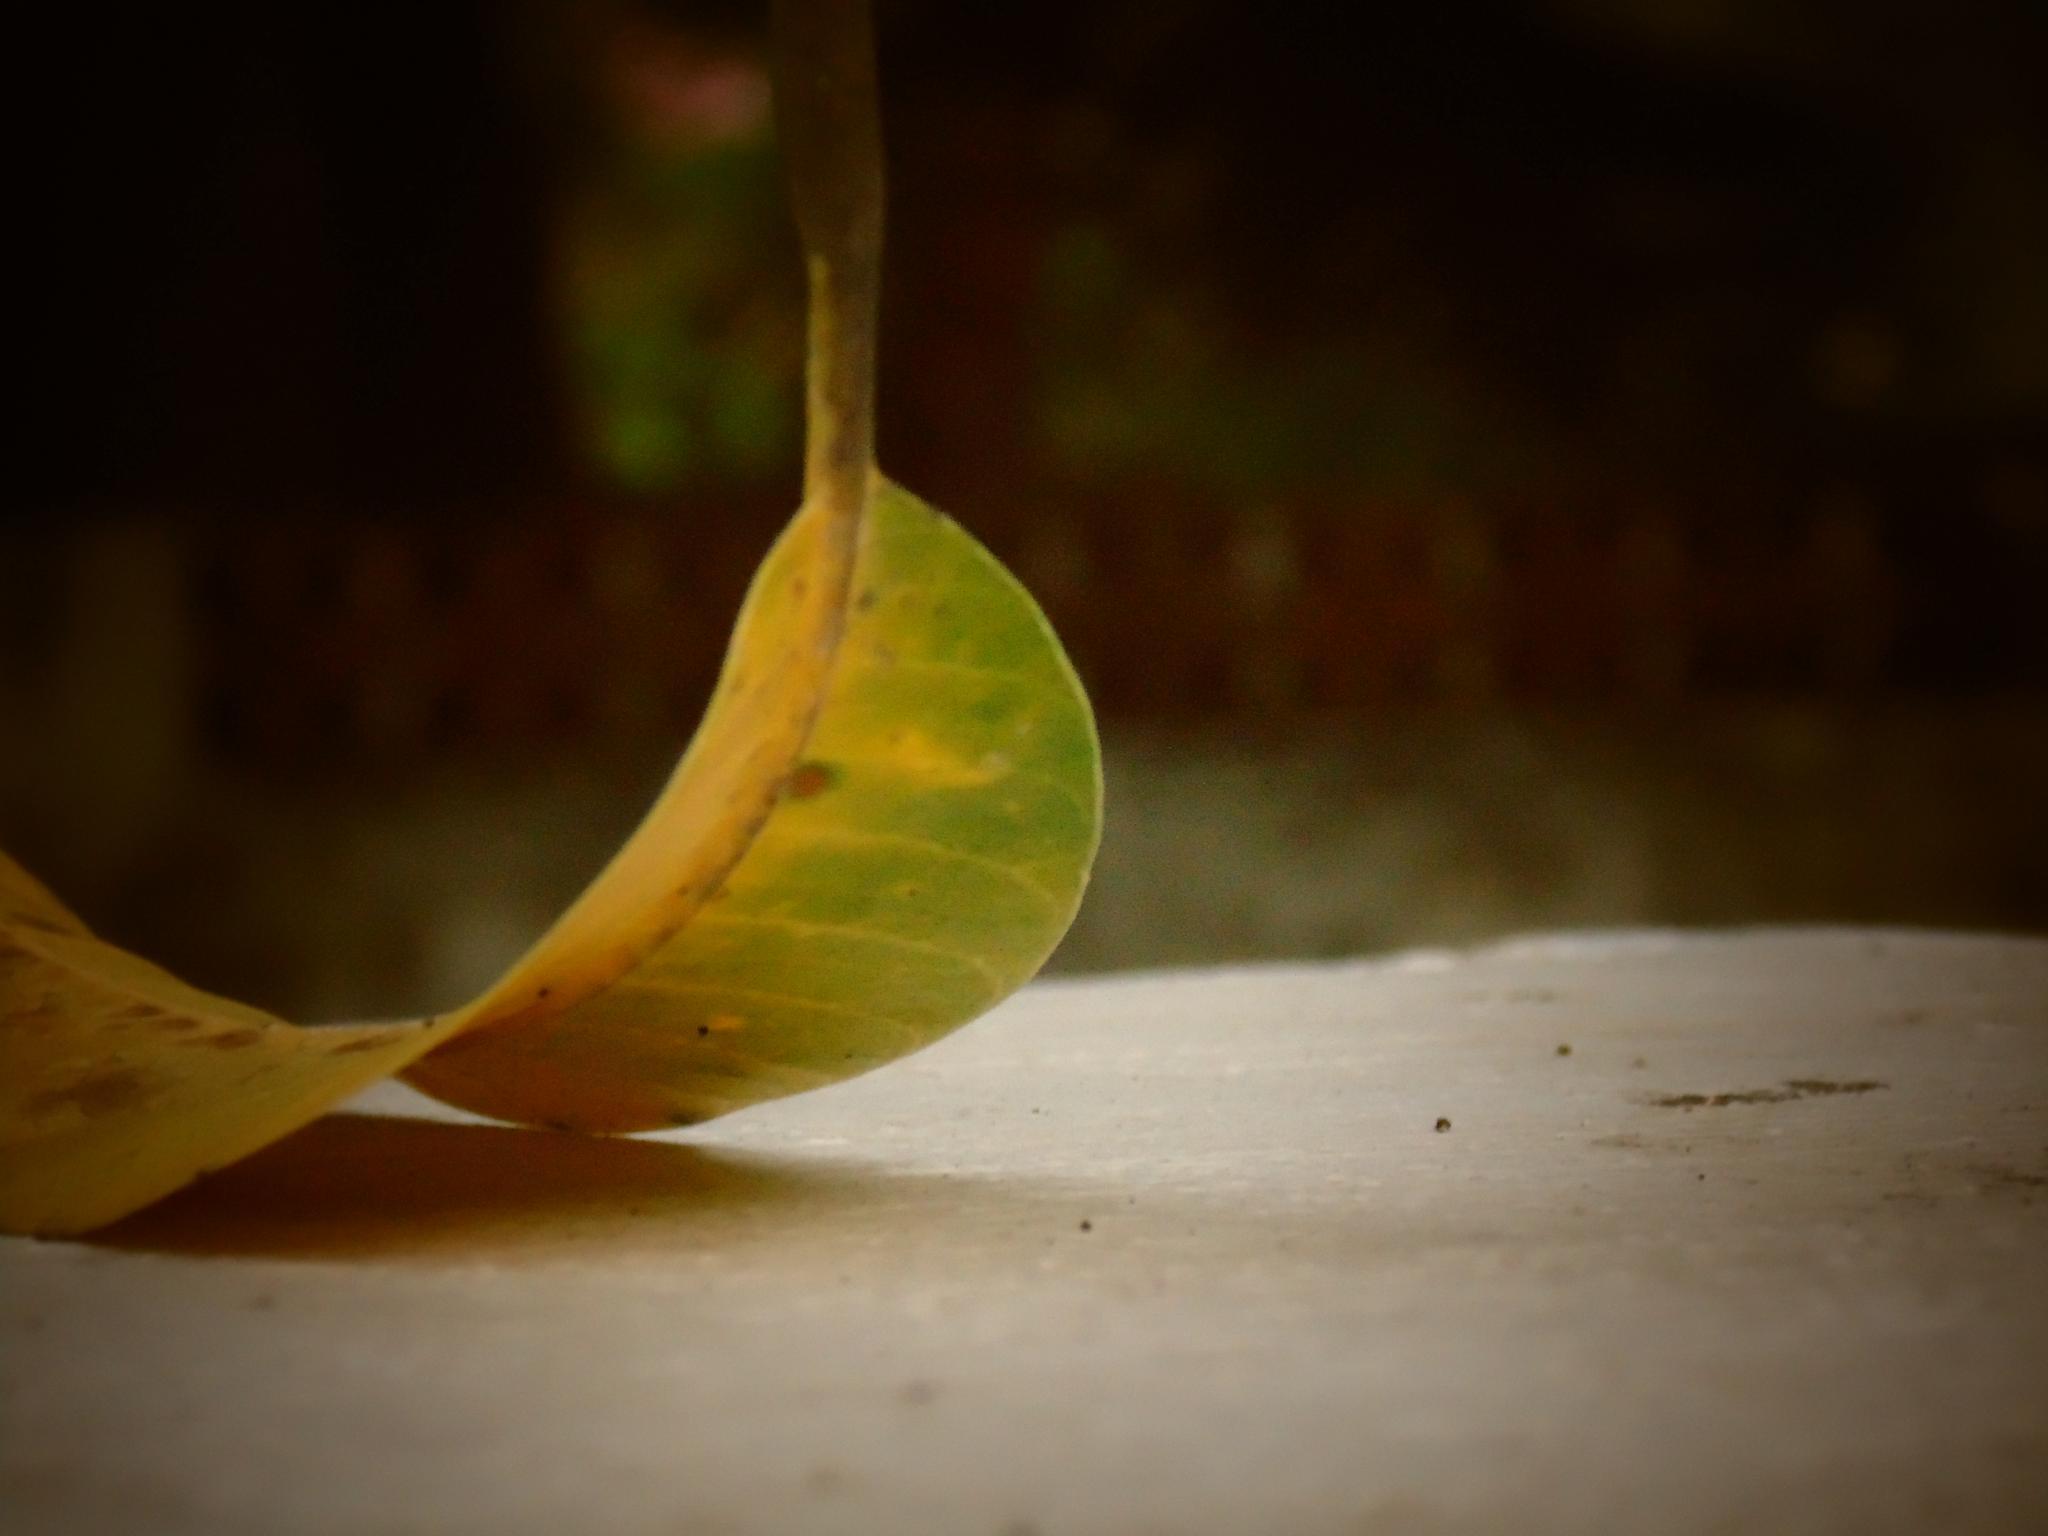 fallen leaf by Charles Paul